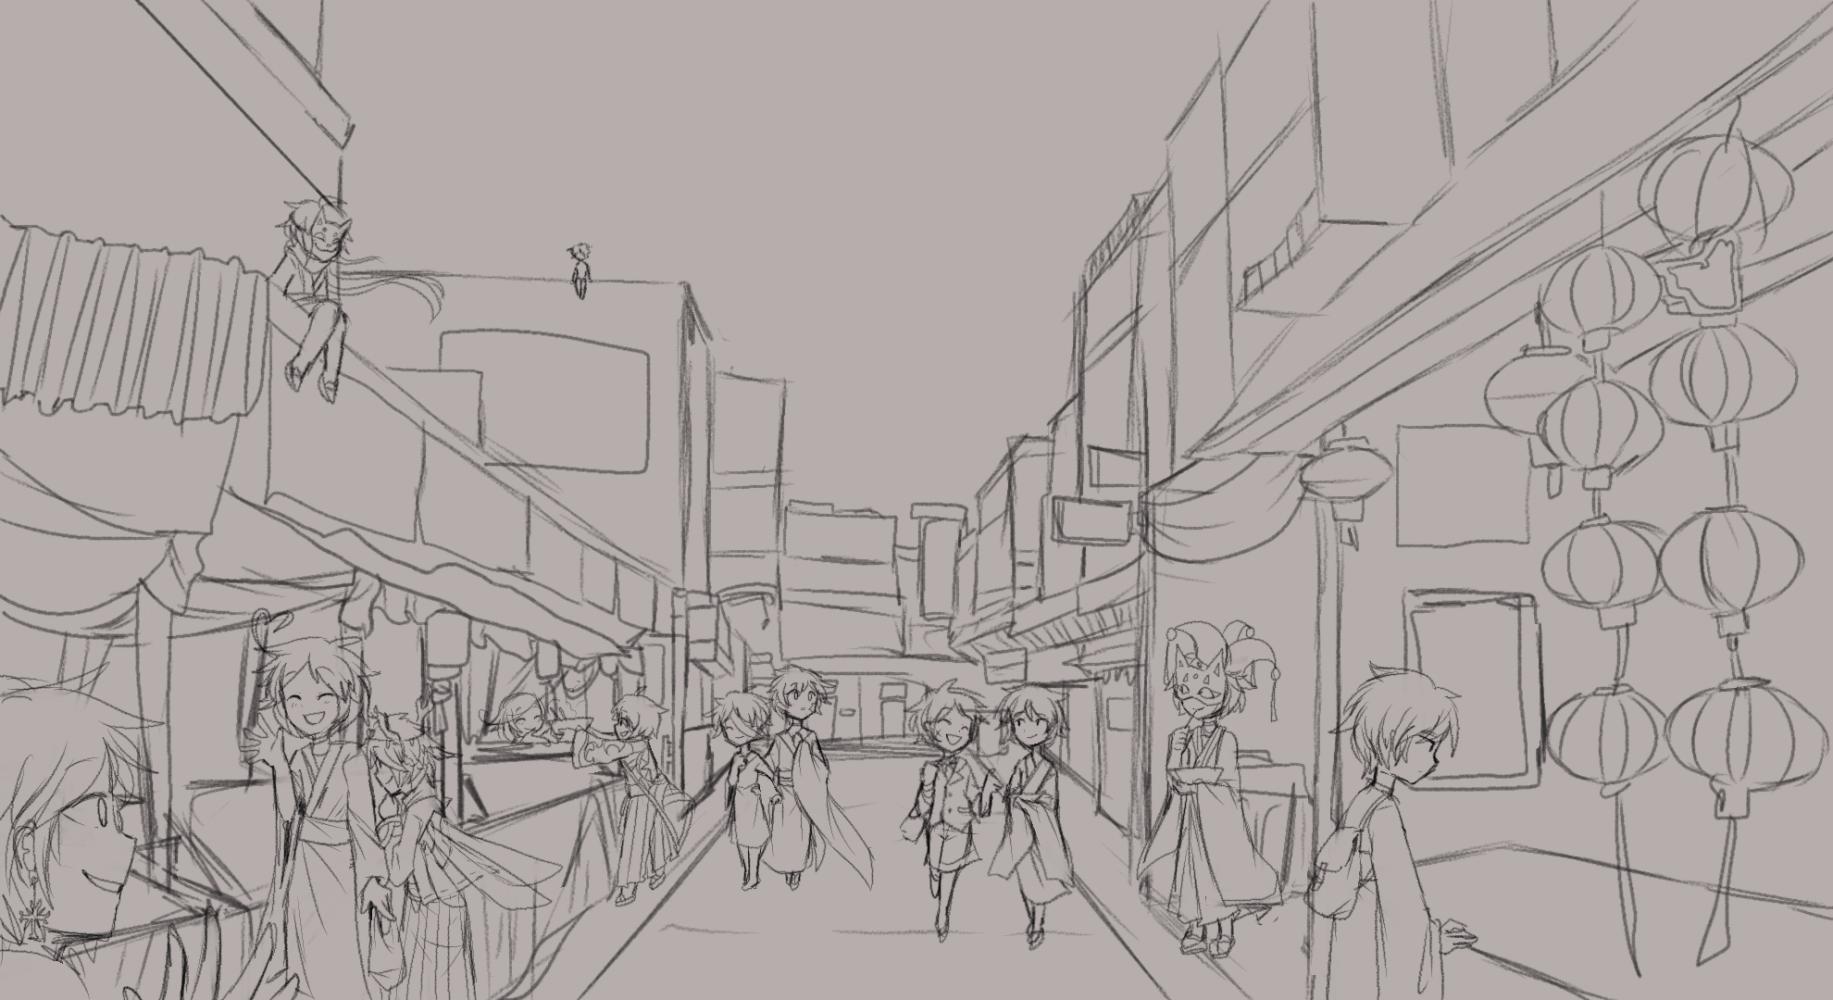 Work in progress by Mayuniki